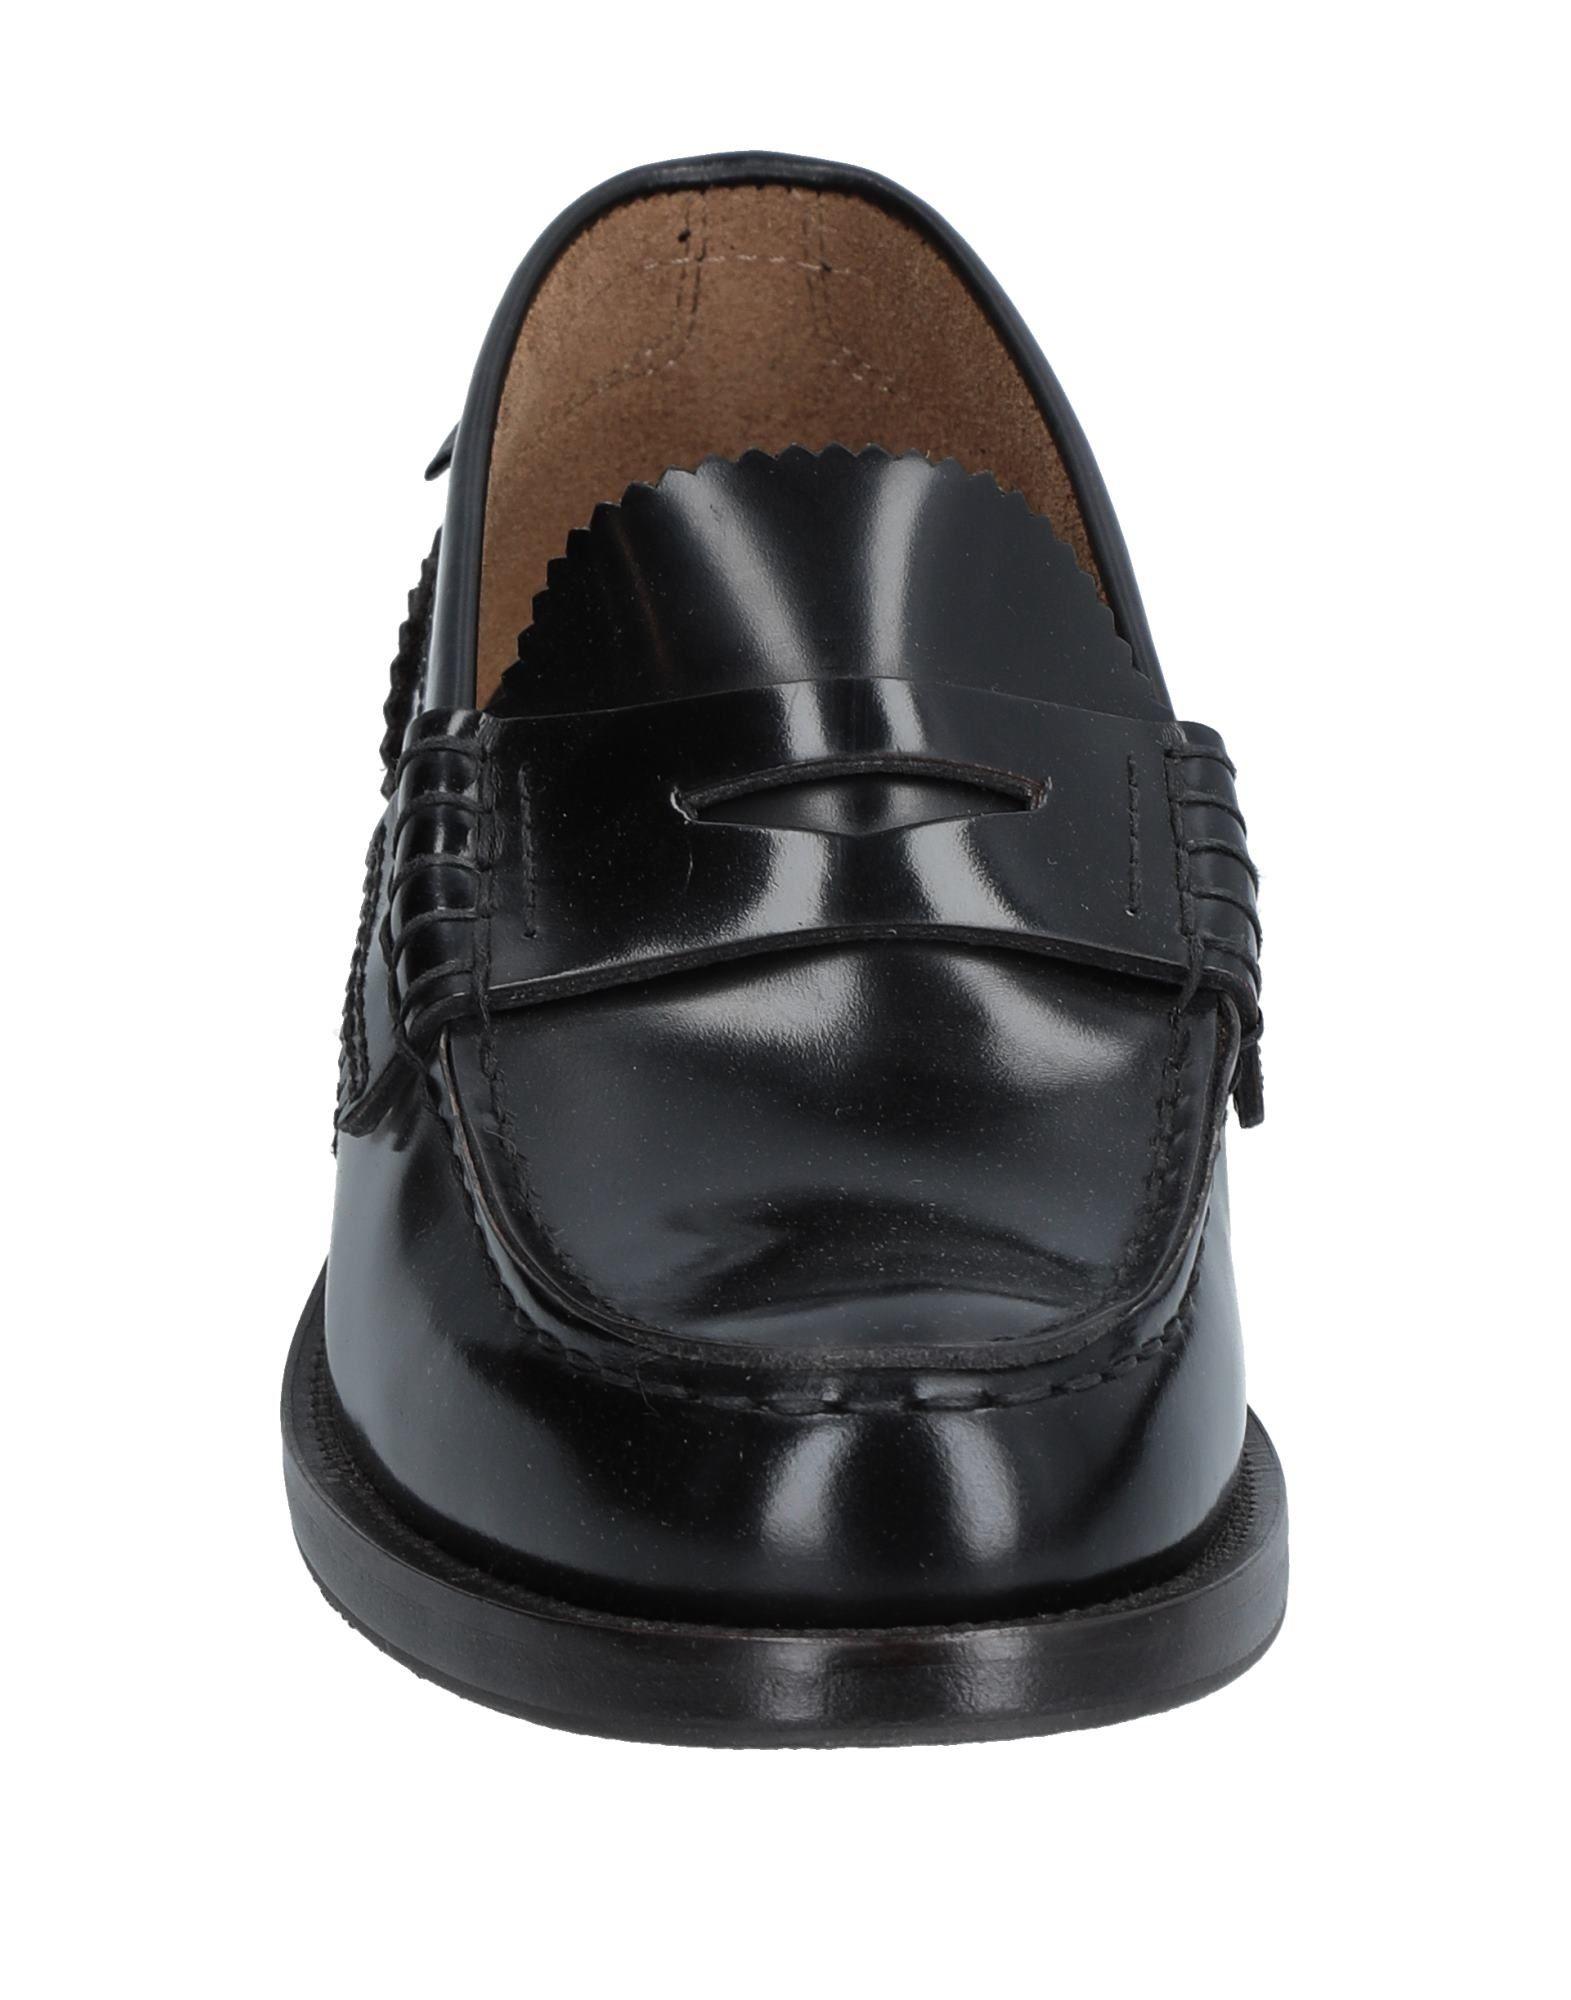 Stilvolle billige Schuhe Mr. & Mrs. College Mokassins Damen Damen Damen  11542003RT ee403b